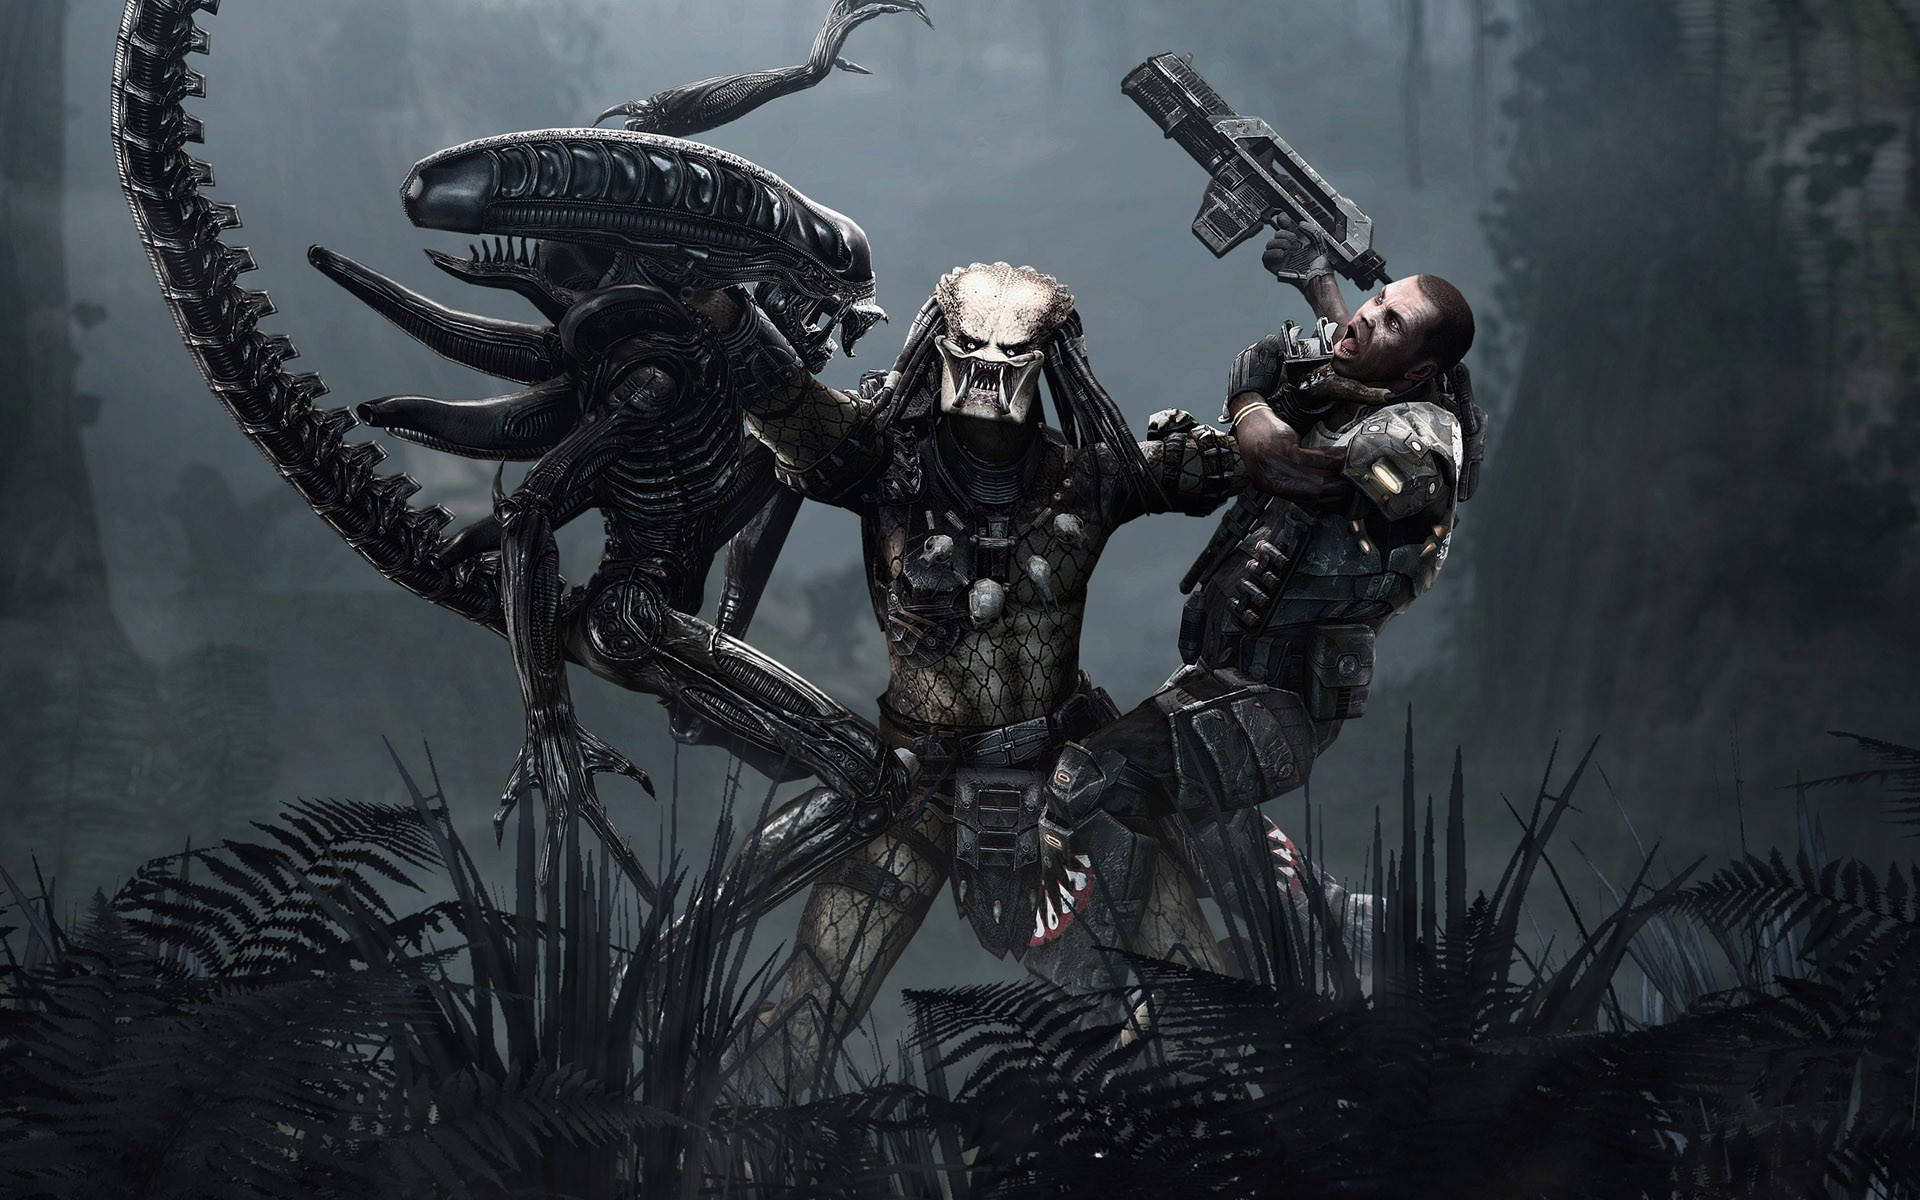 alien vs predator game hd wallpaper 1920x1200 4813 1920x1200